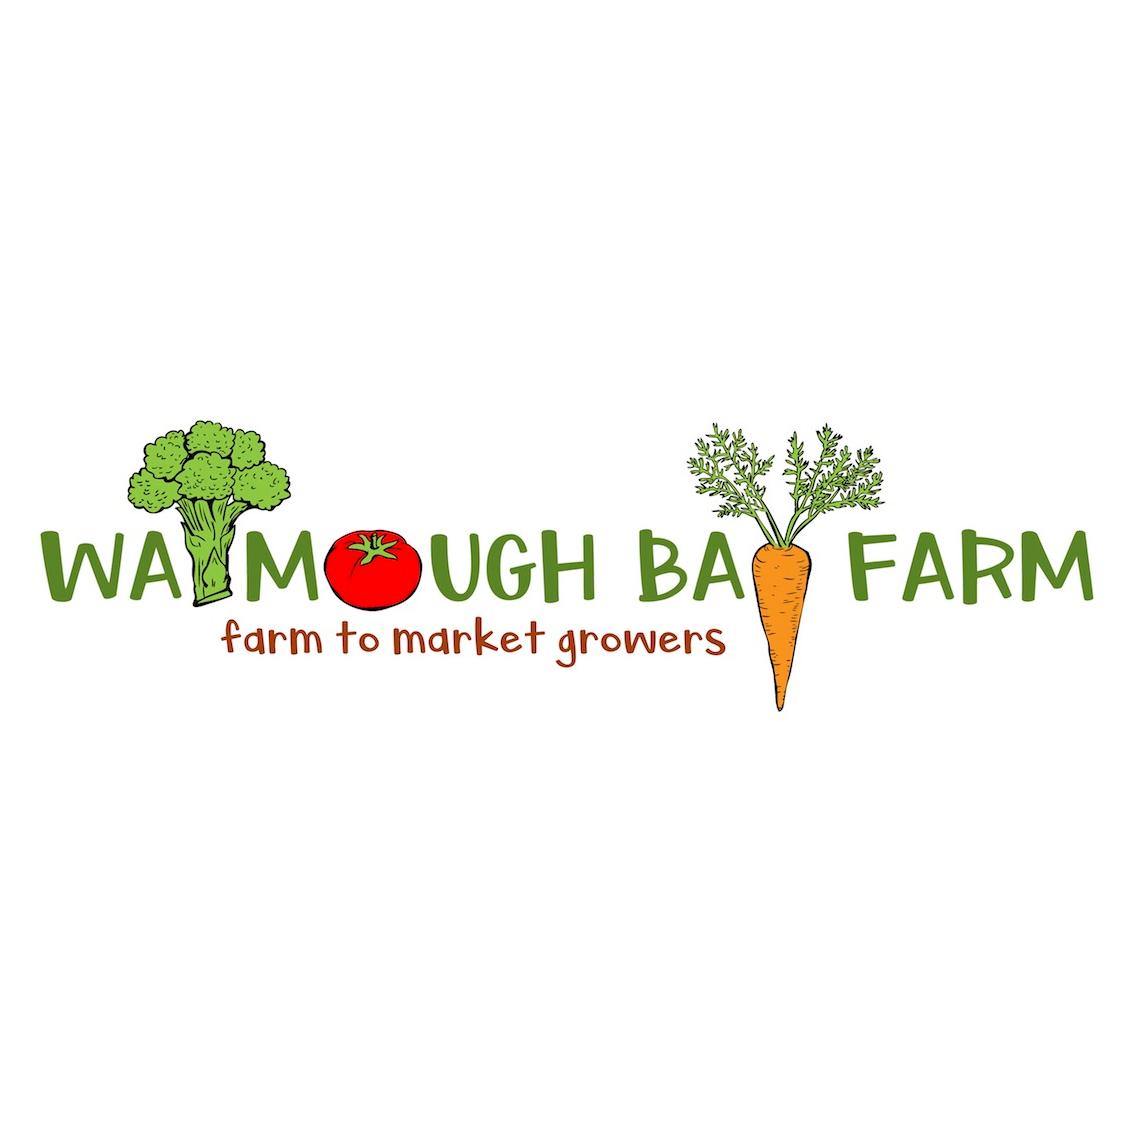 Watmough Bay Farm